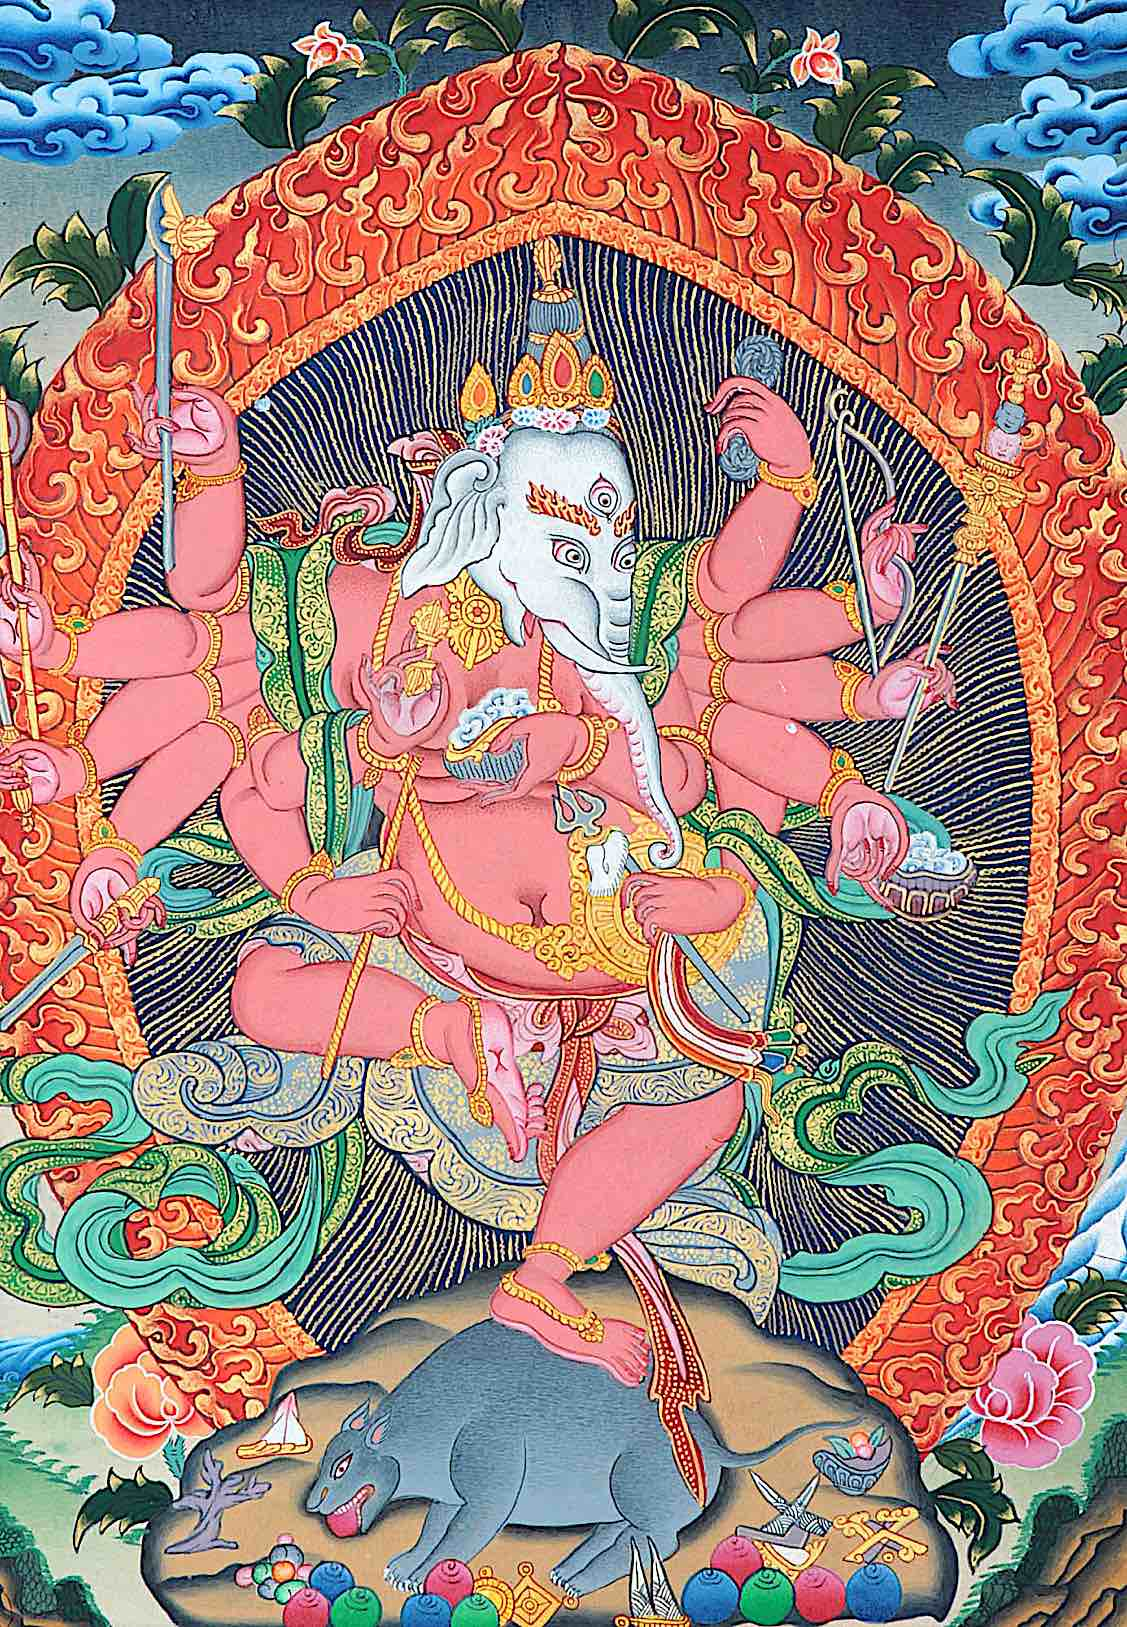 Buddha Weekly Fierce many armed Ganesha Tibetan Buddhism